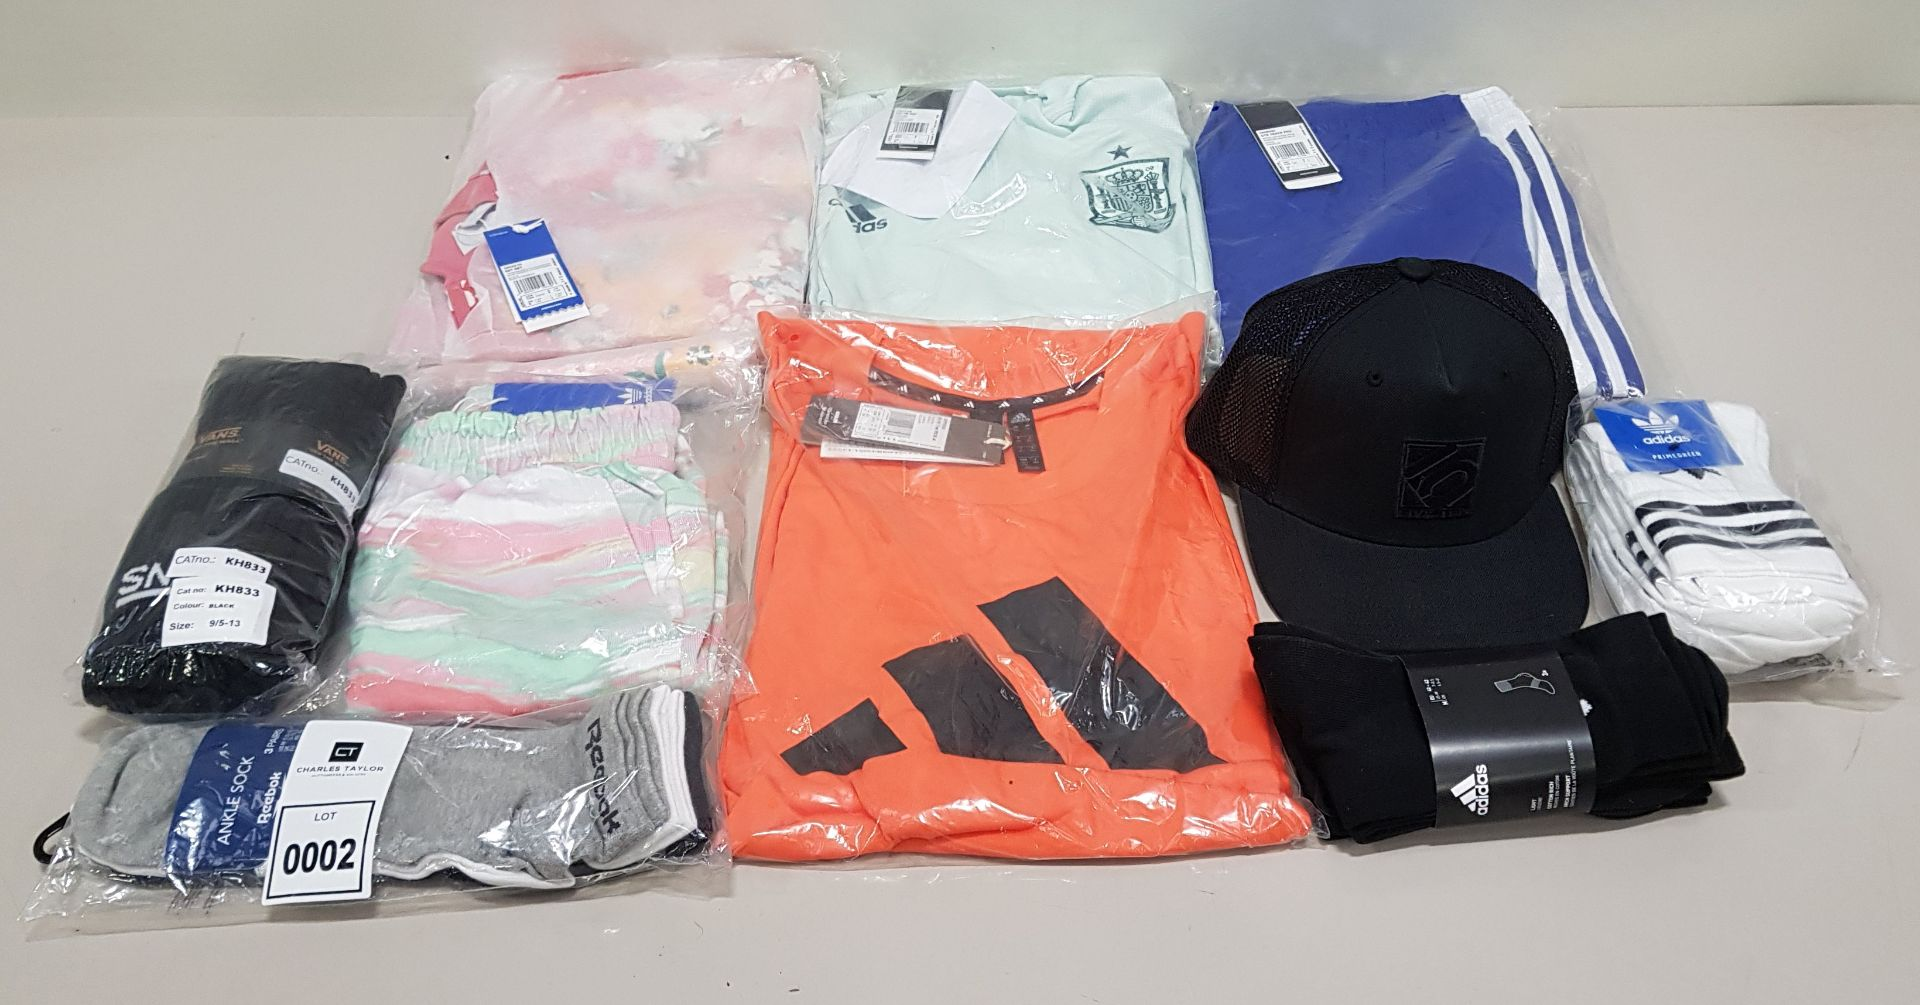 10 PIECE CLOTHING LOT CONTAINING ADIDAS SOCKS, VANS SOCKS, ADIDAS HAT, ADIDAS TRACK PANTS AND REEBOK